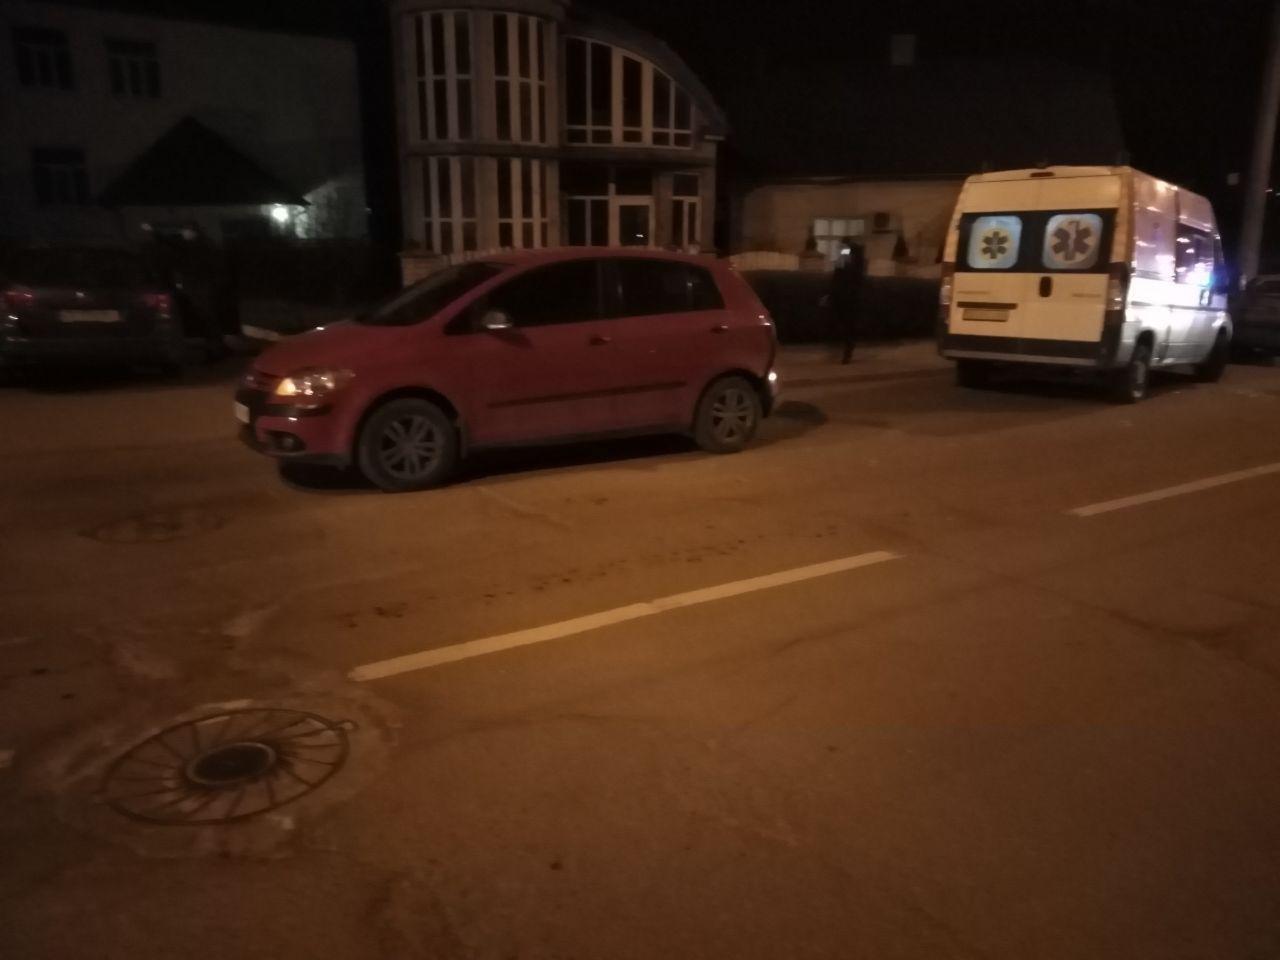 Через масштабну ДТП перекрито рух вулицею Руською, фото-2